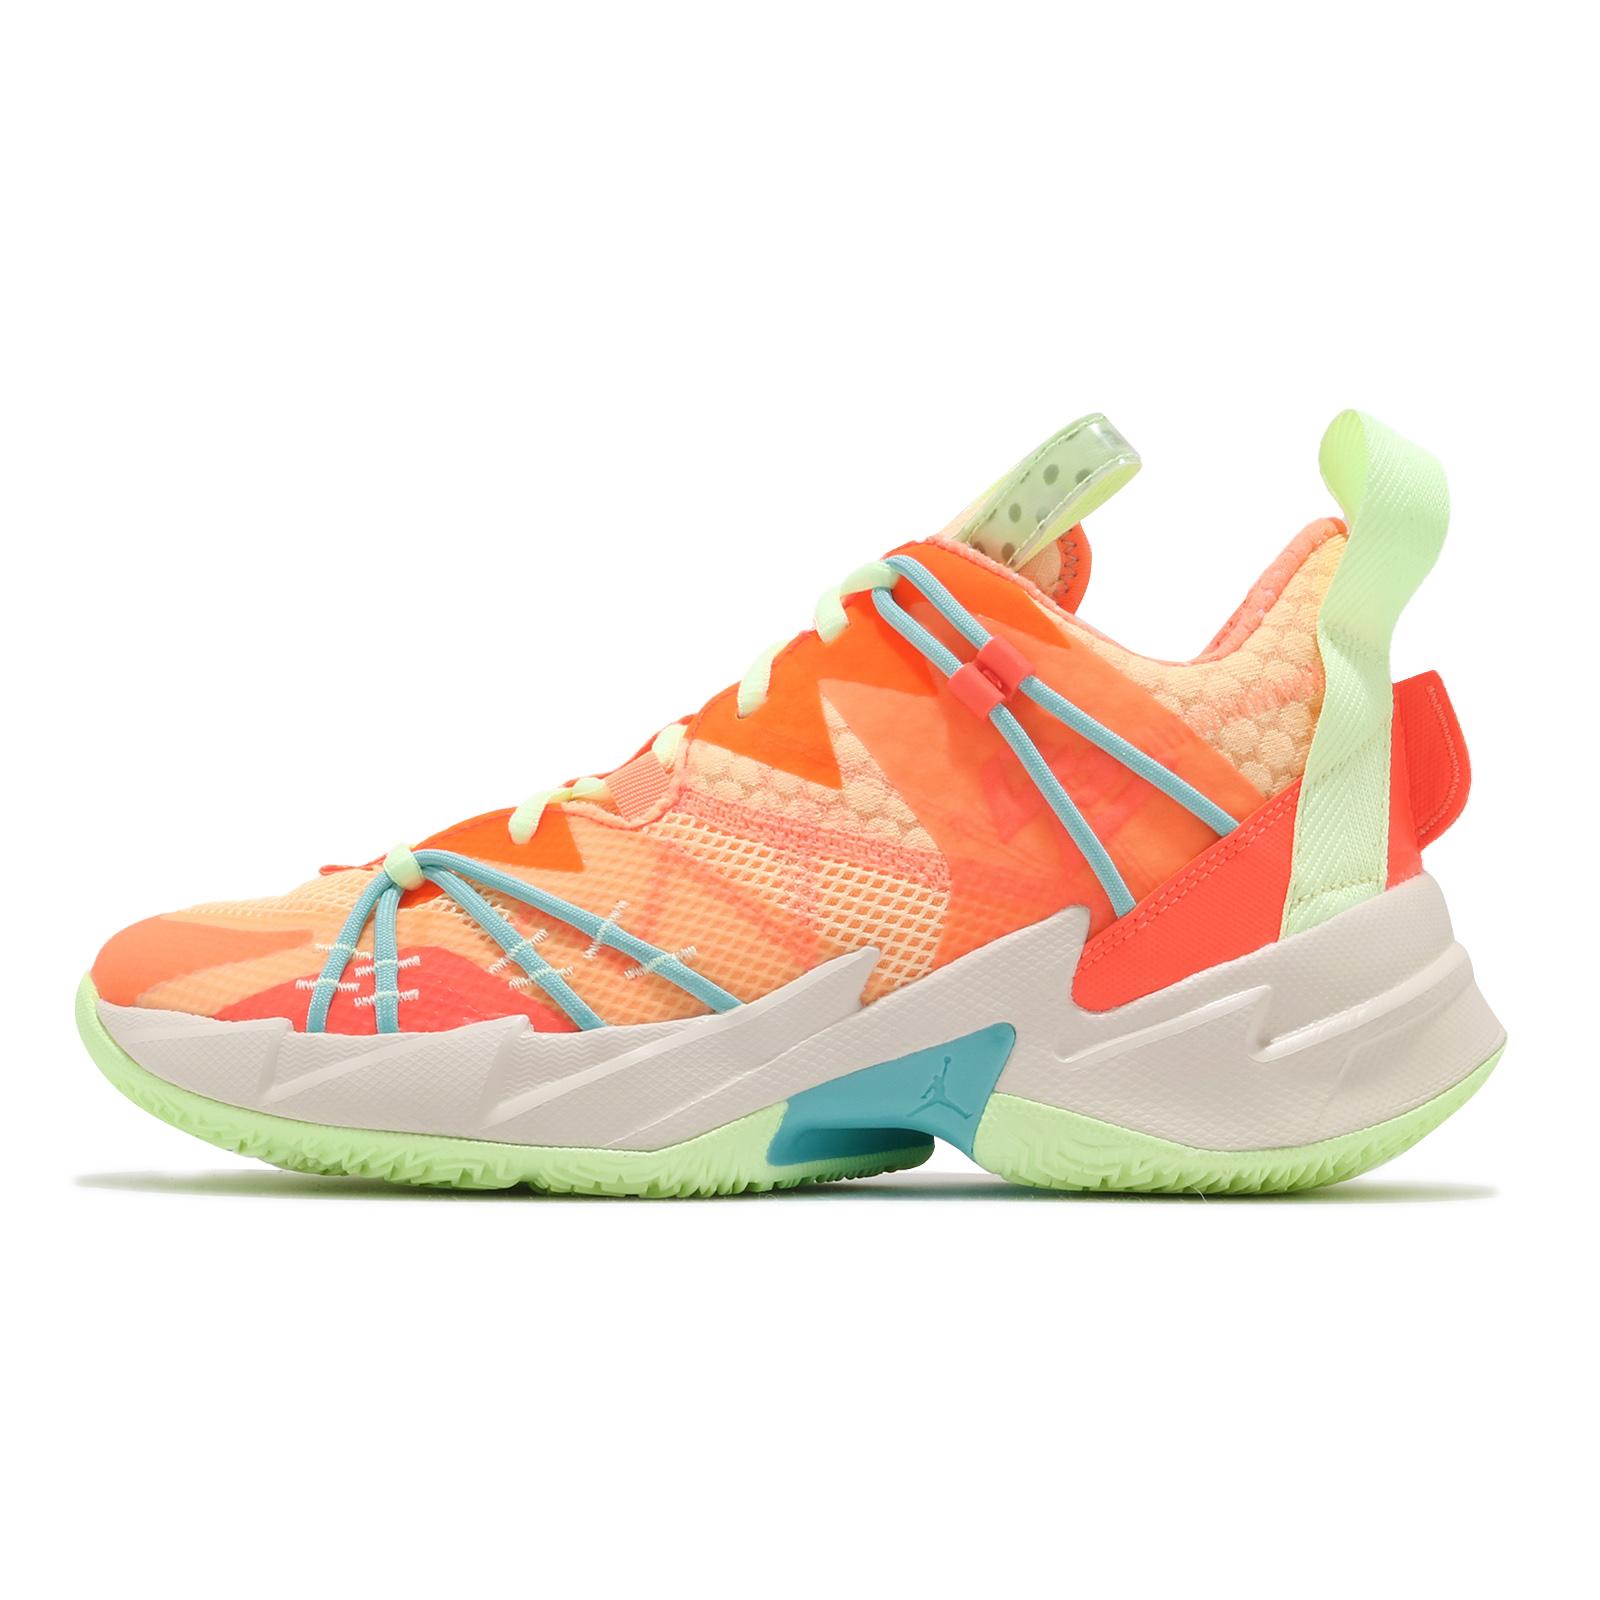 Nike 籃球鞋 Jordan Why Not Zer0.3 SE PF 橘 綠 男鞋 【ACS】 CK6612-800